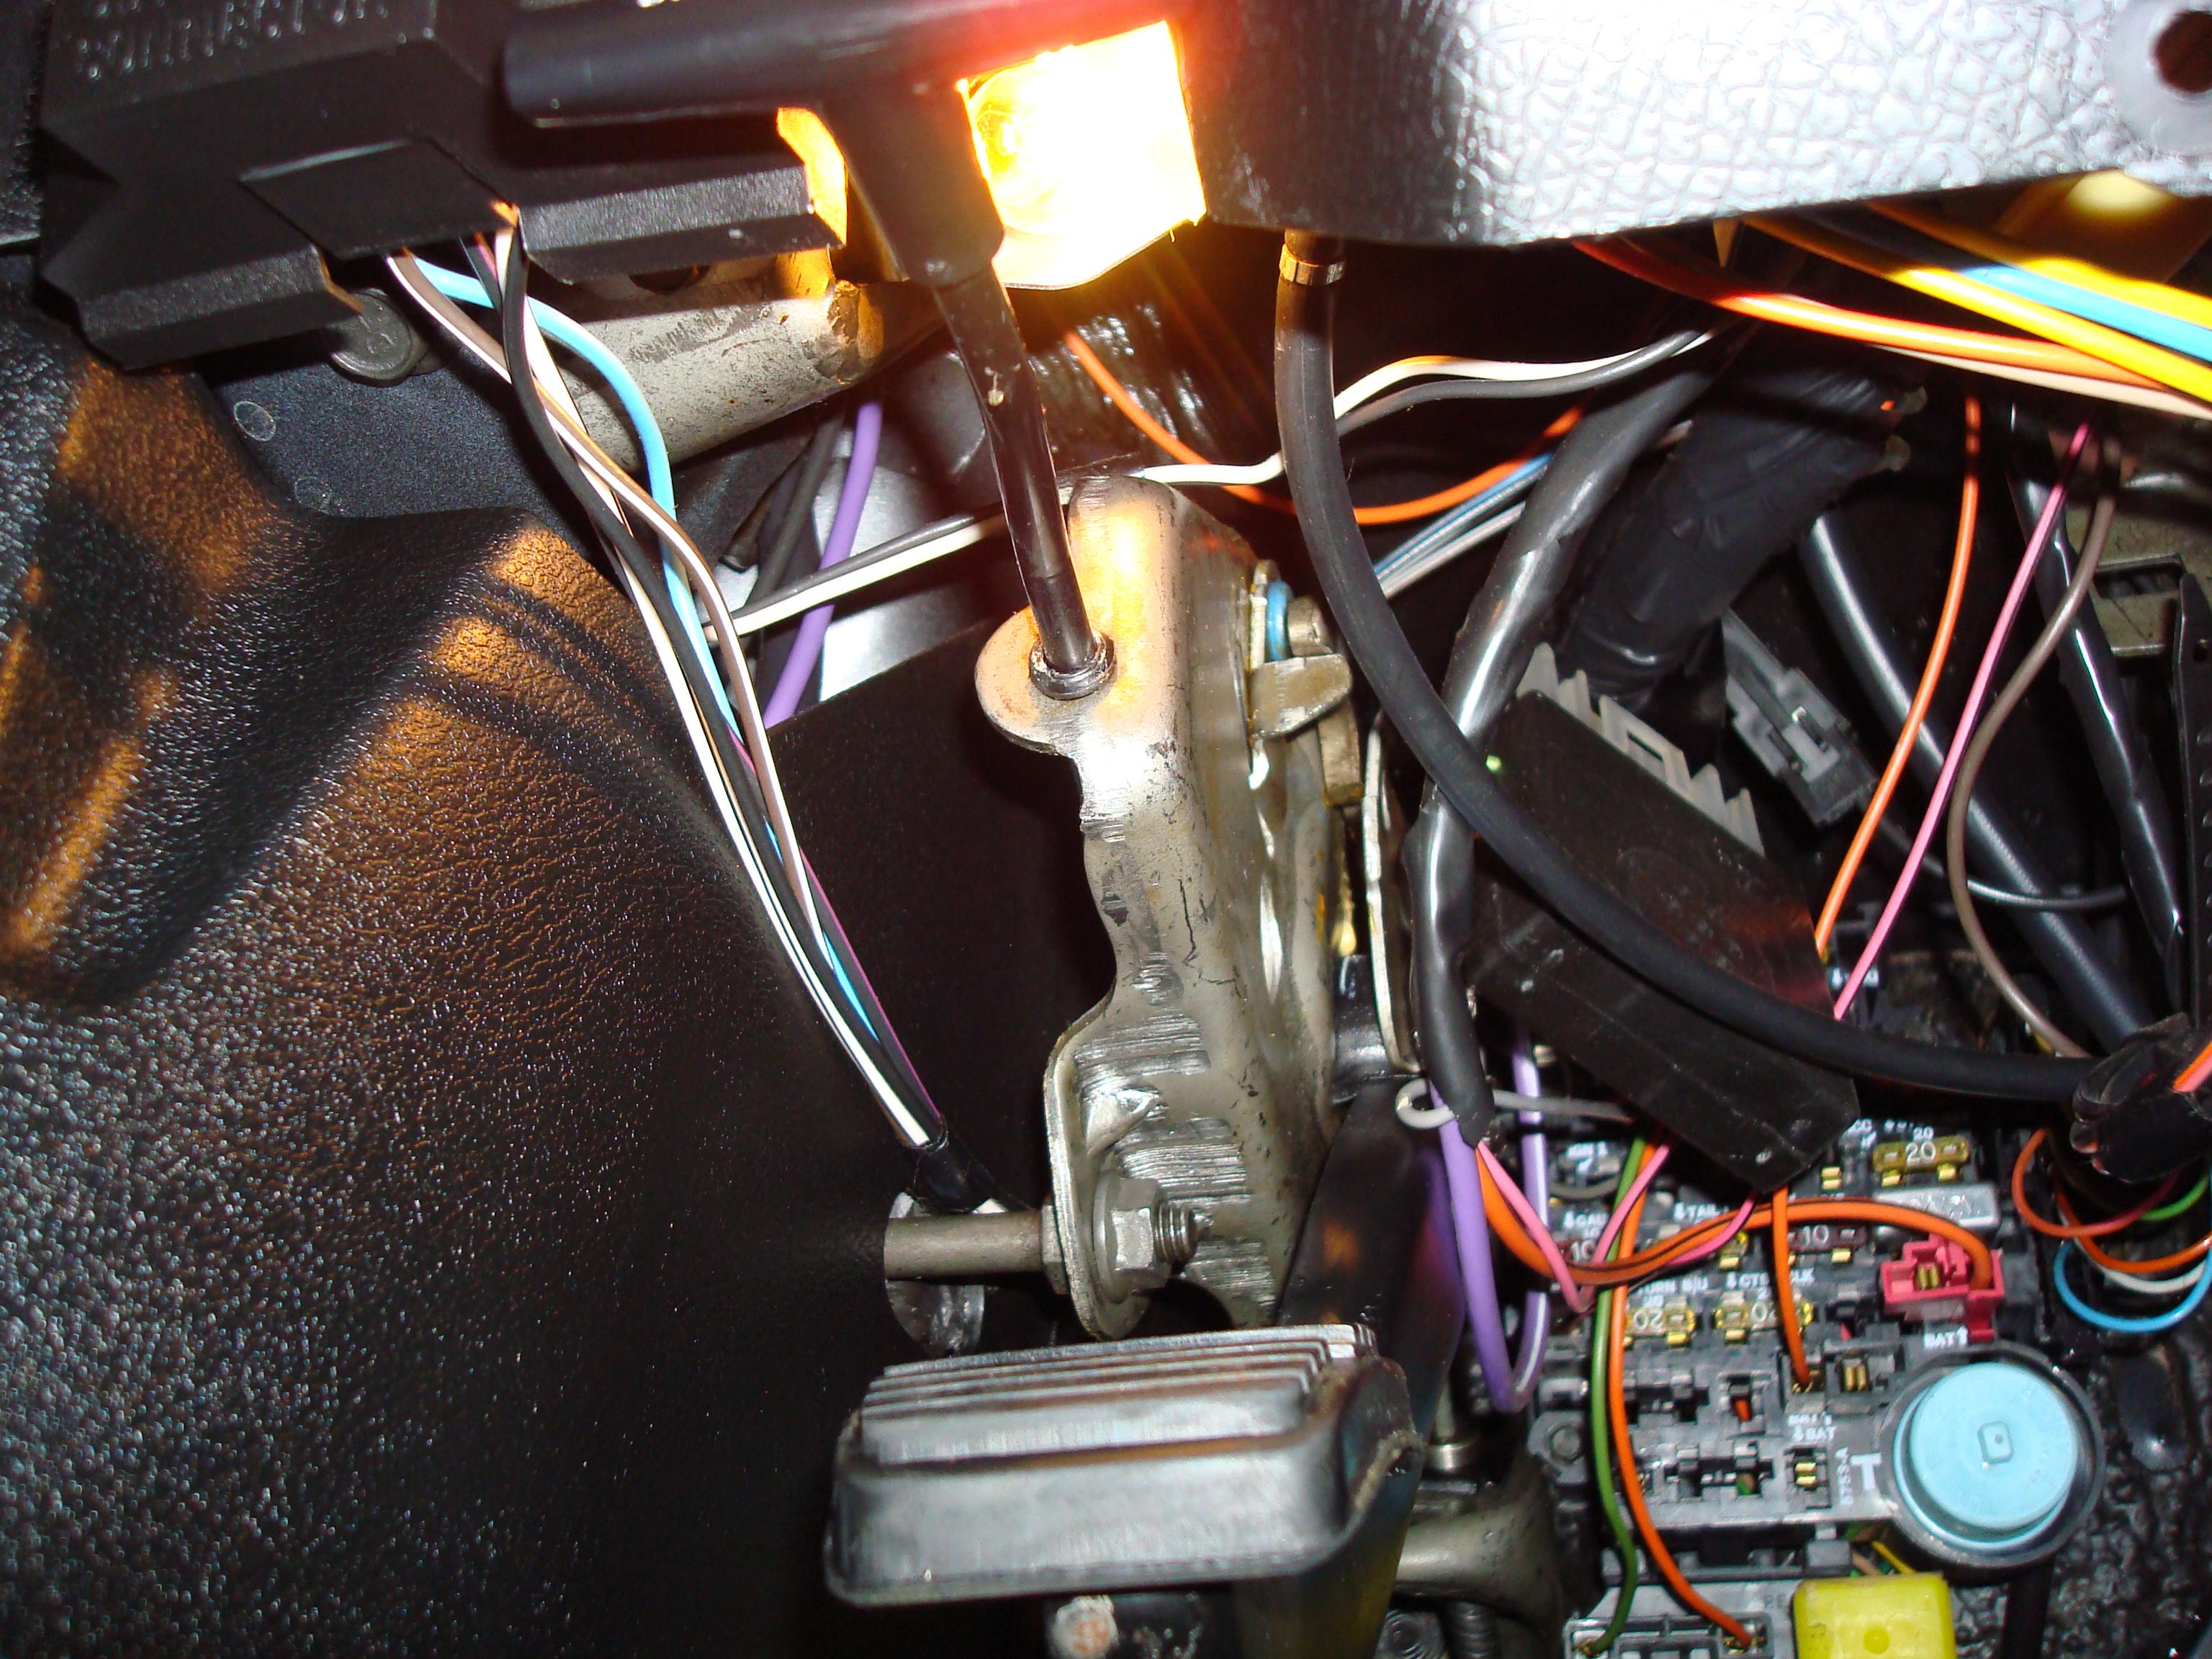 1981 Camaro Fuse Panel Diagram Wiring Diagrams 2000 E250 Box 20 Images F350